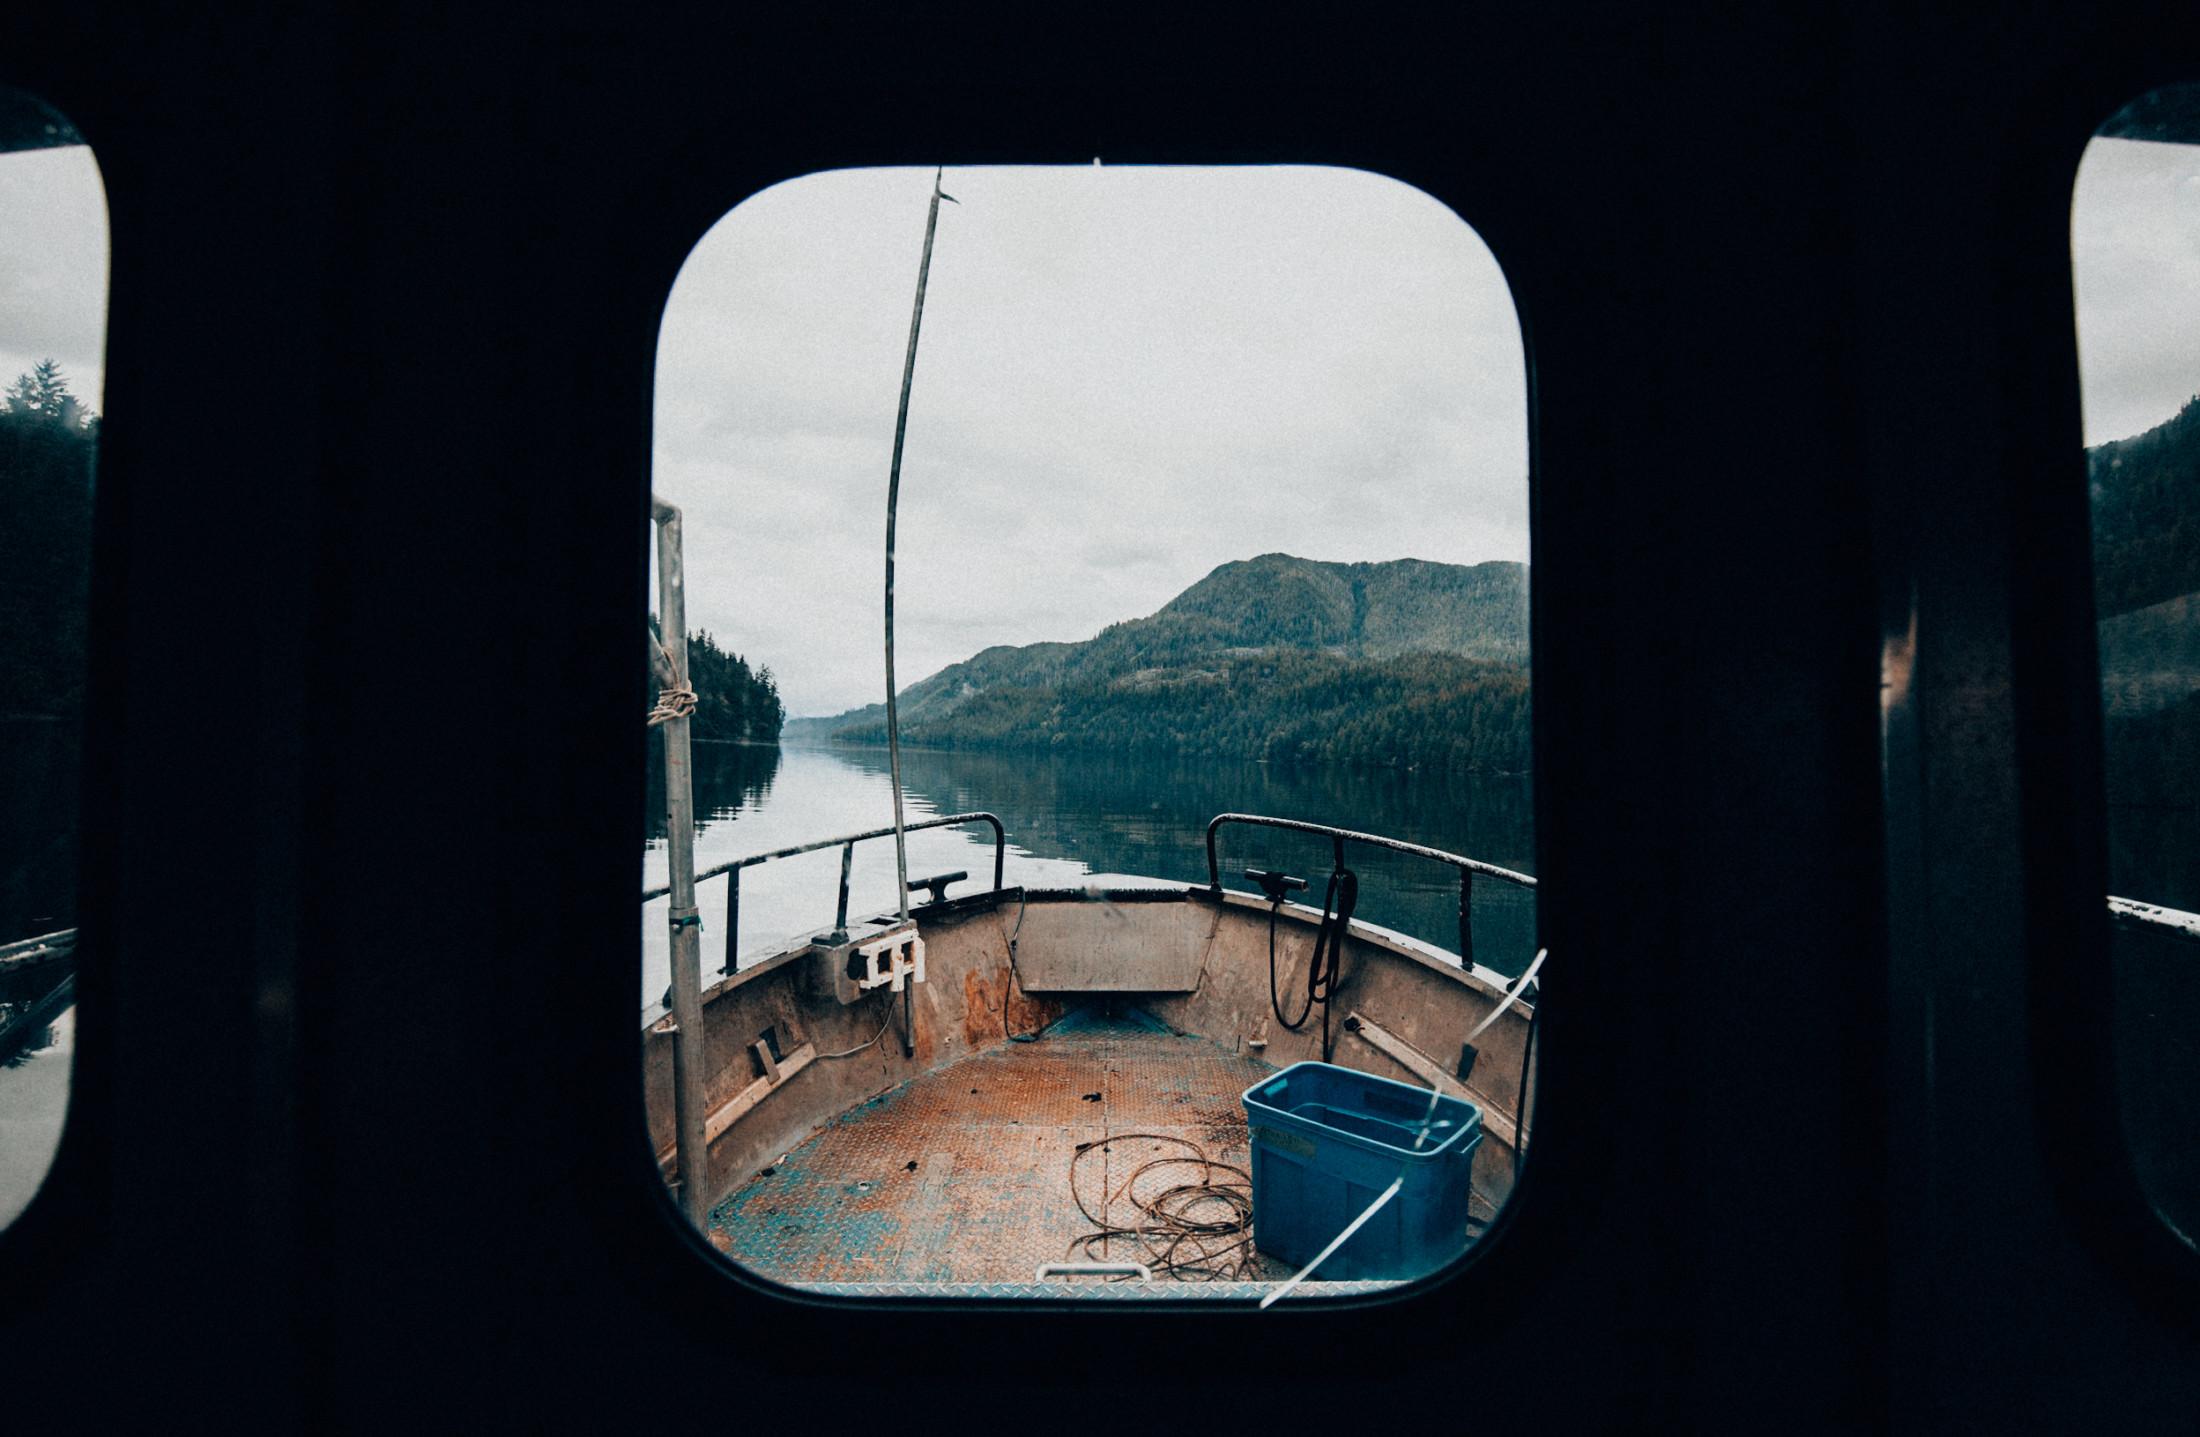 Heiltsuk territory